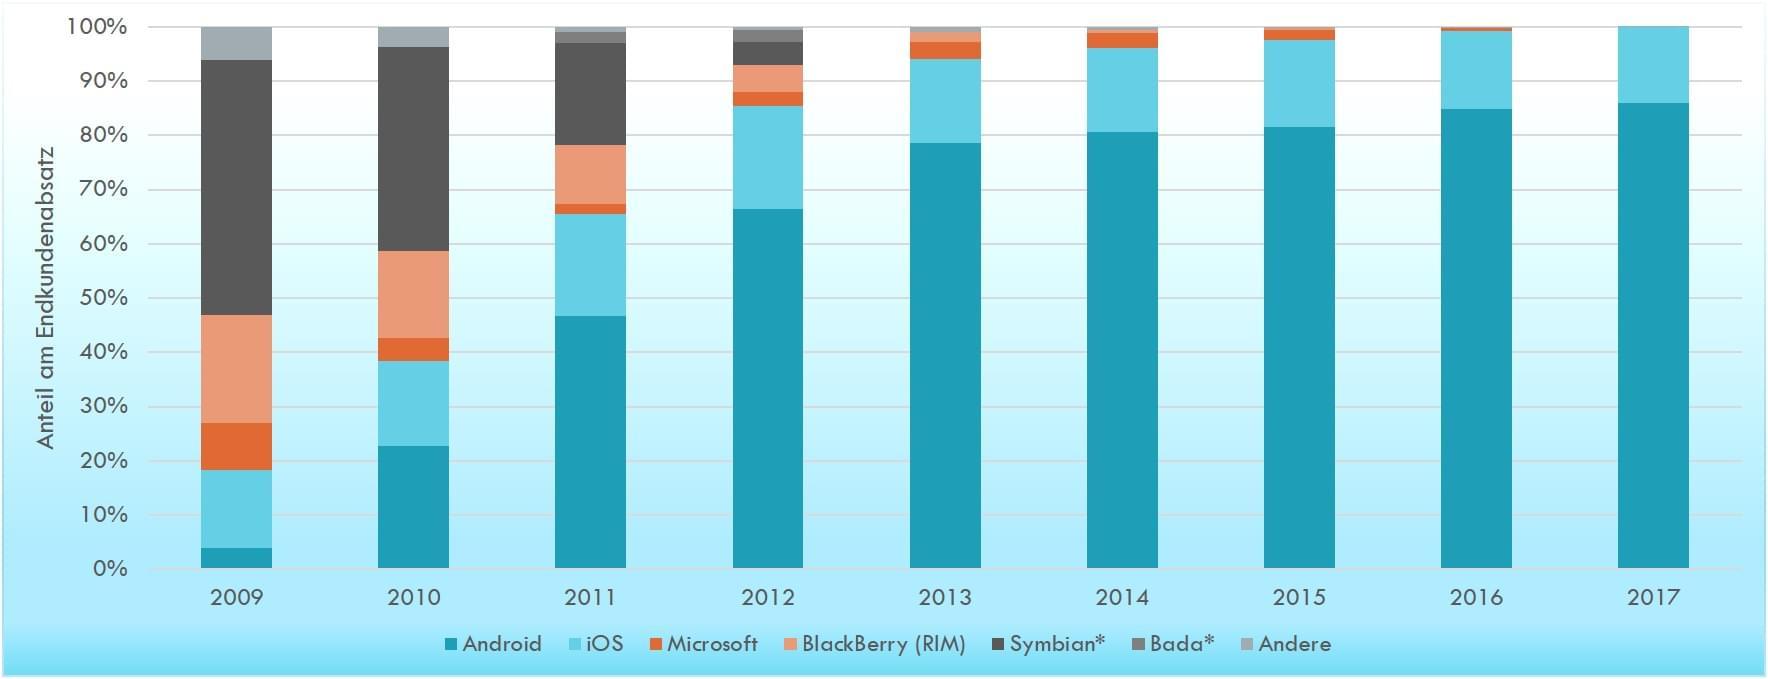 Statistik Anzahl mobiler Betriebssysteme